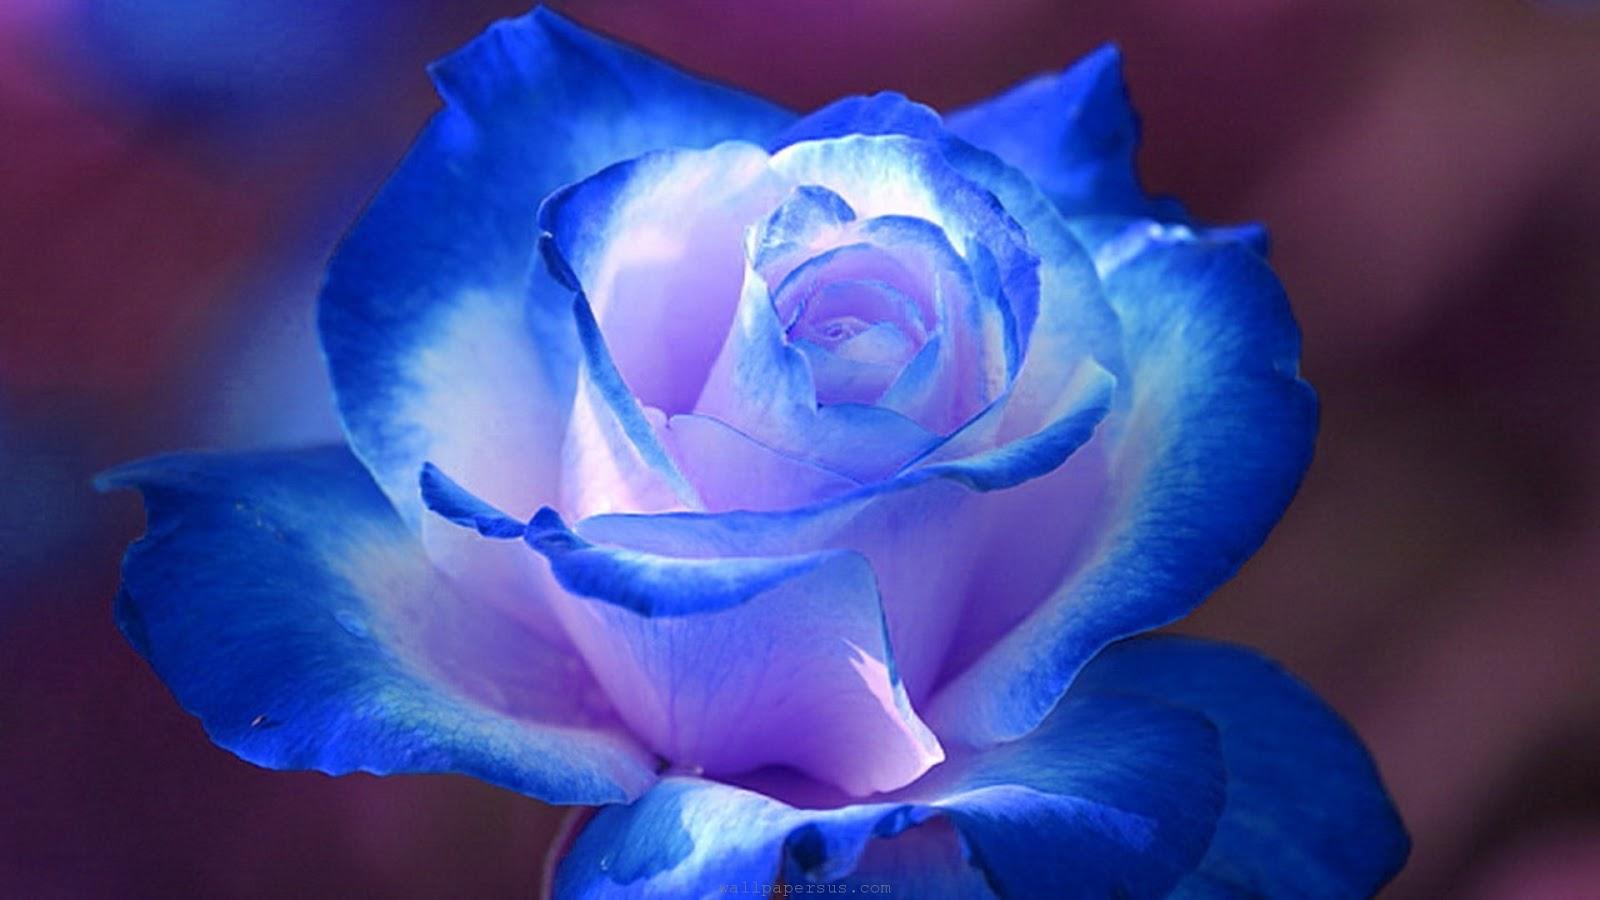 Flowerflower hd photosflower wallpapersflower picsflower 1080p 1600x900